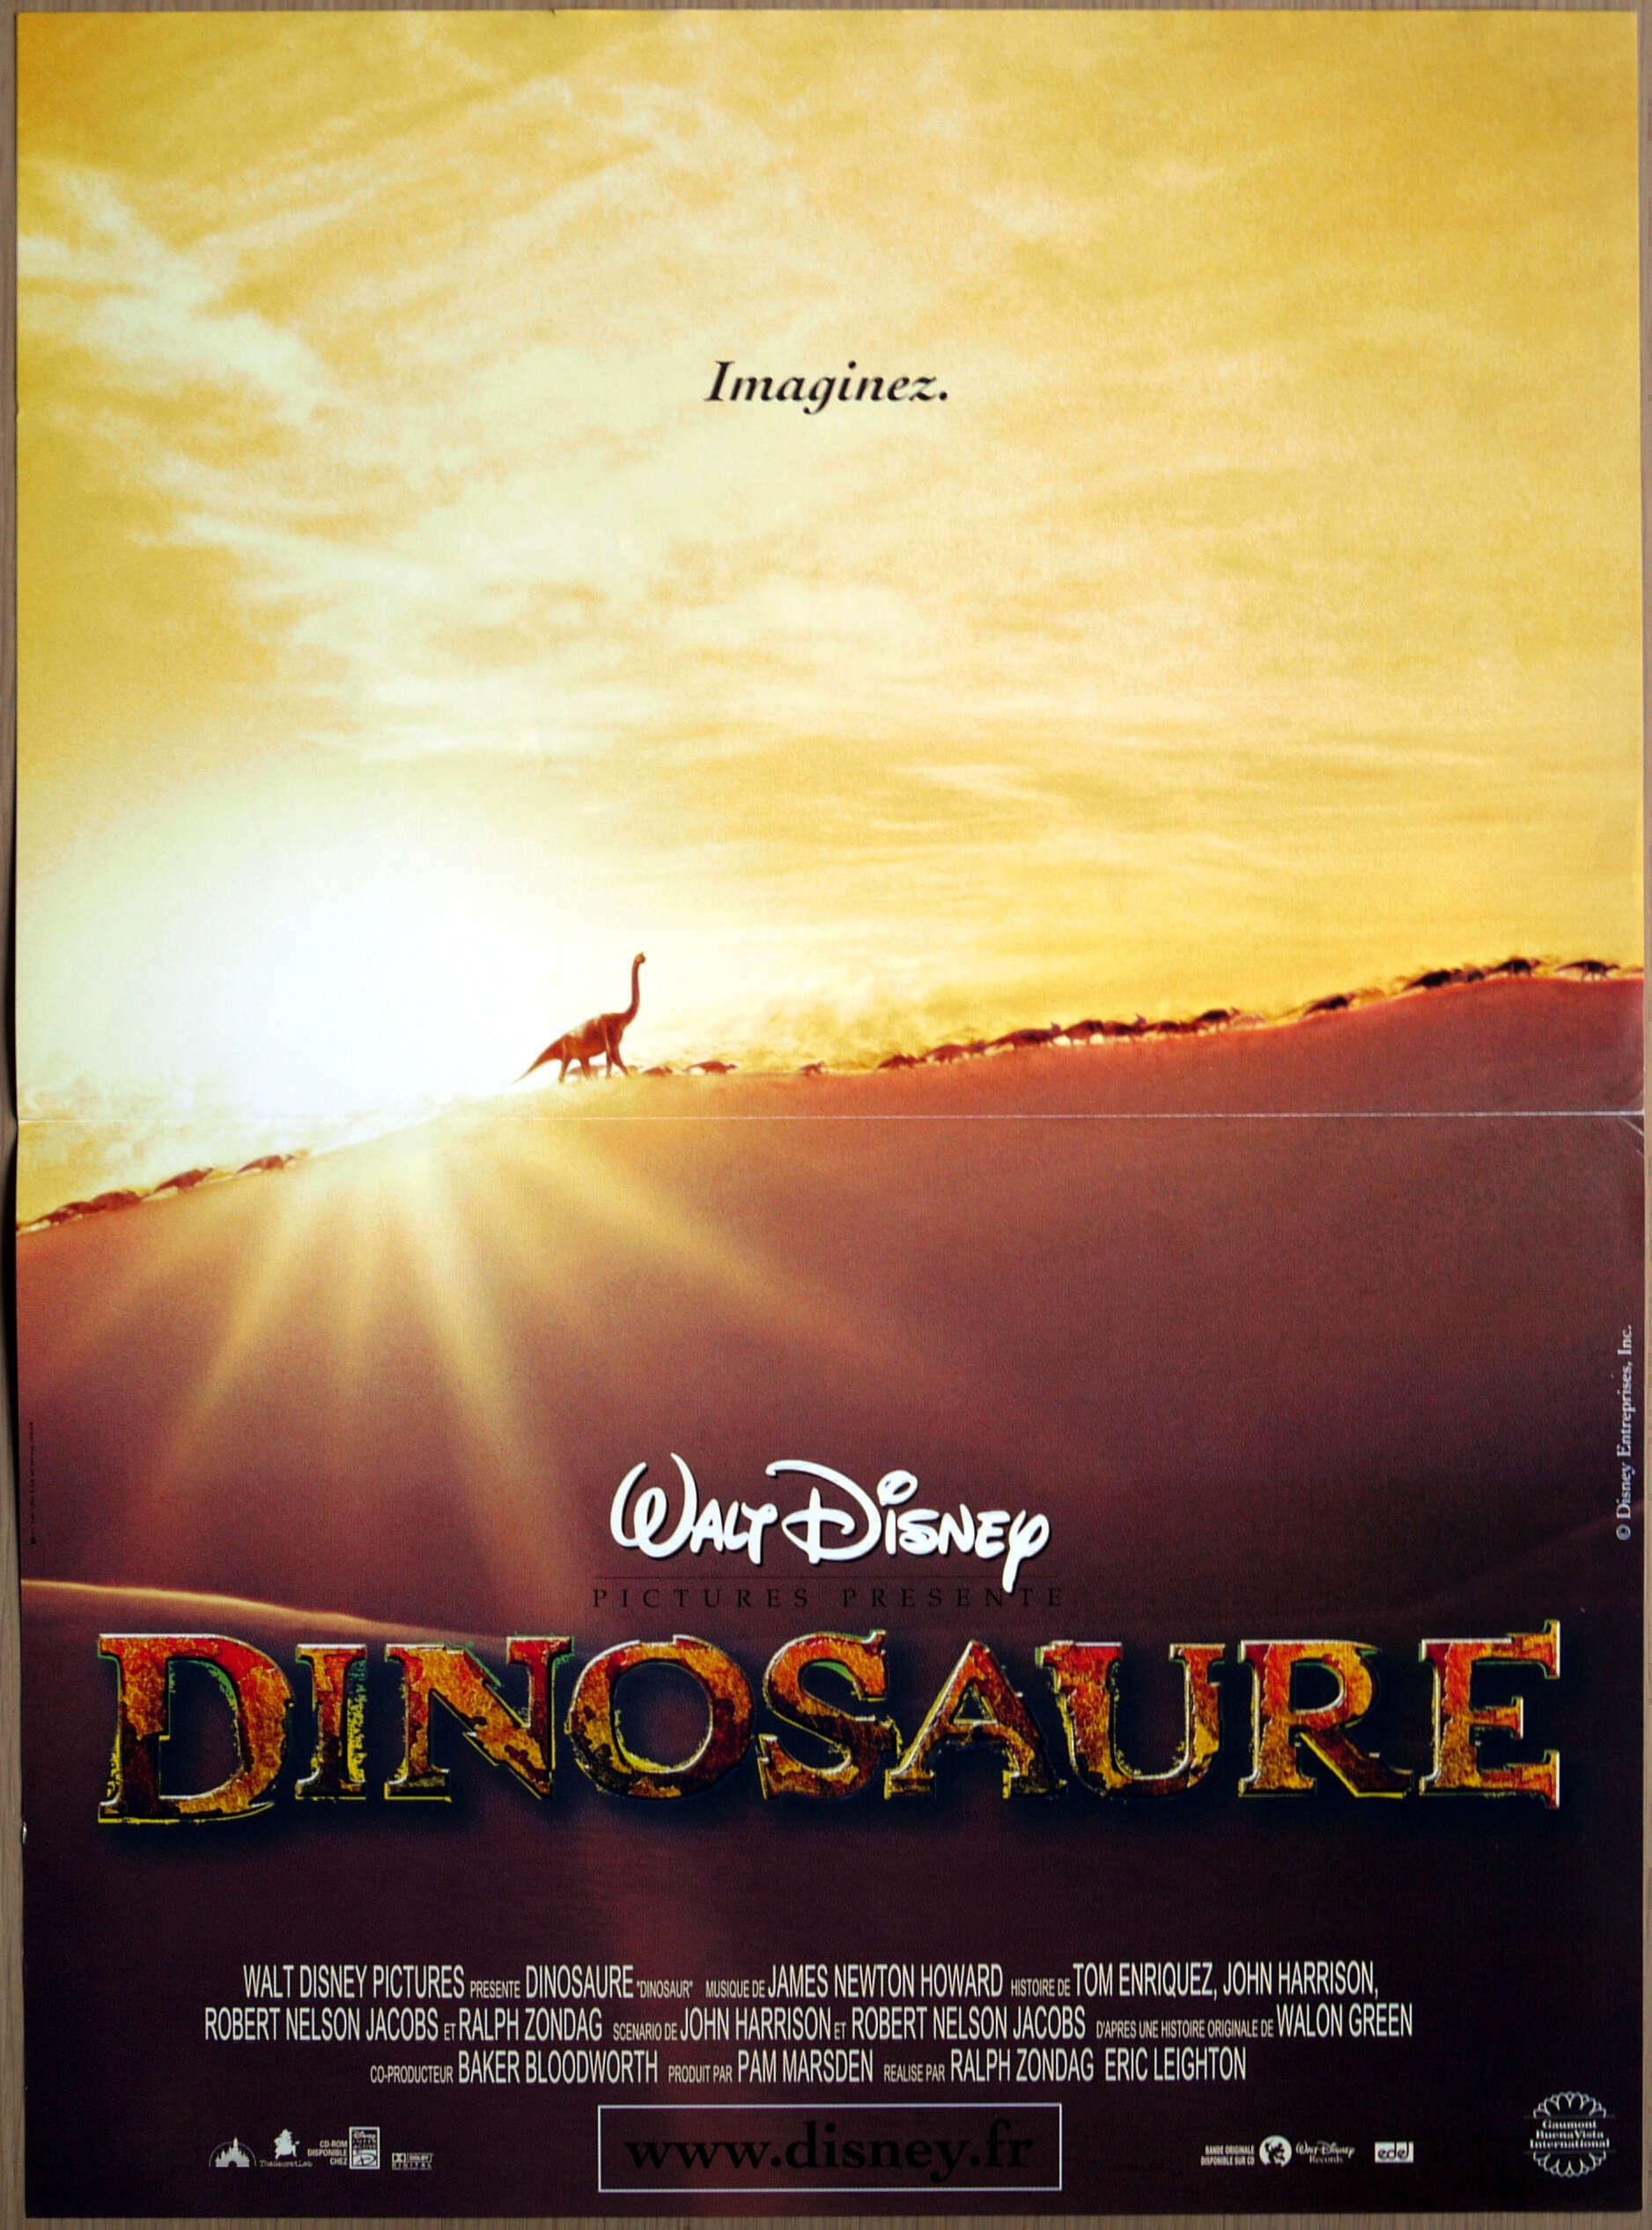 Dinosaure (film, 2000)